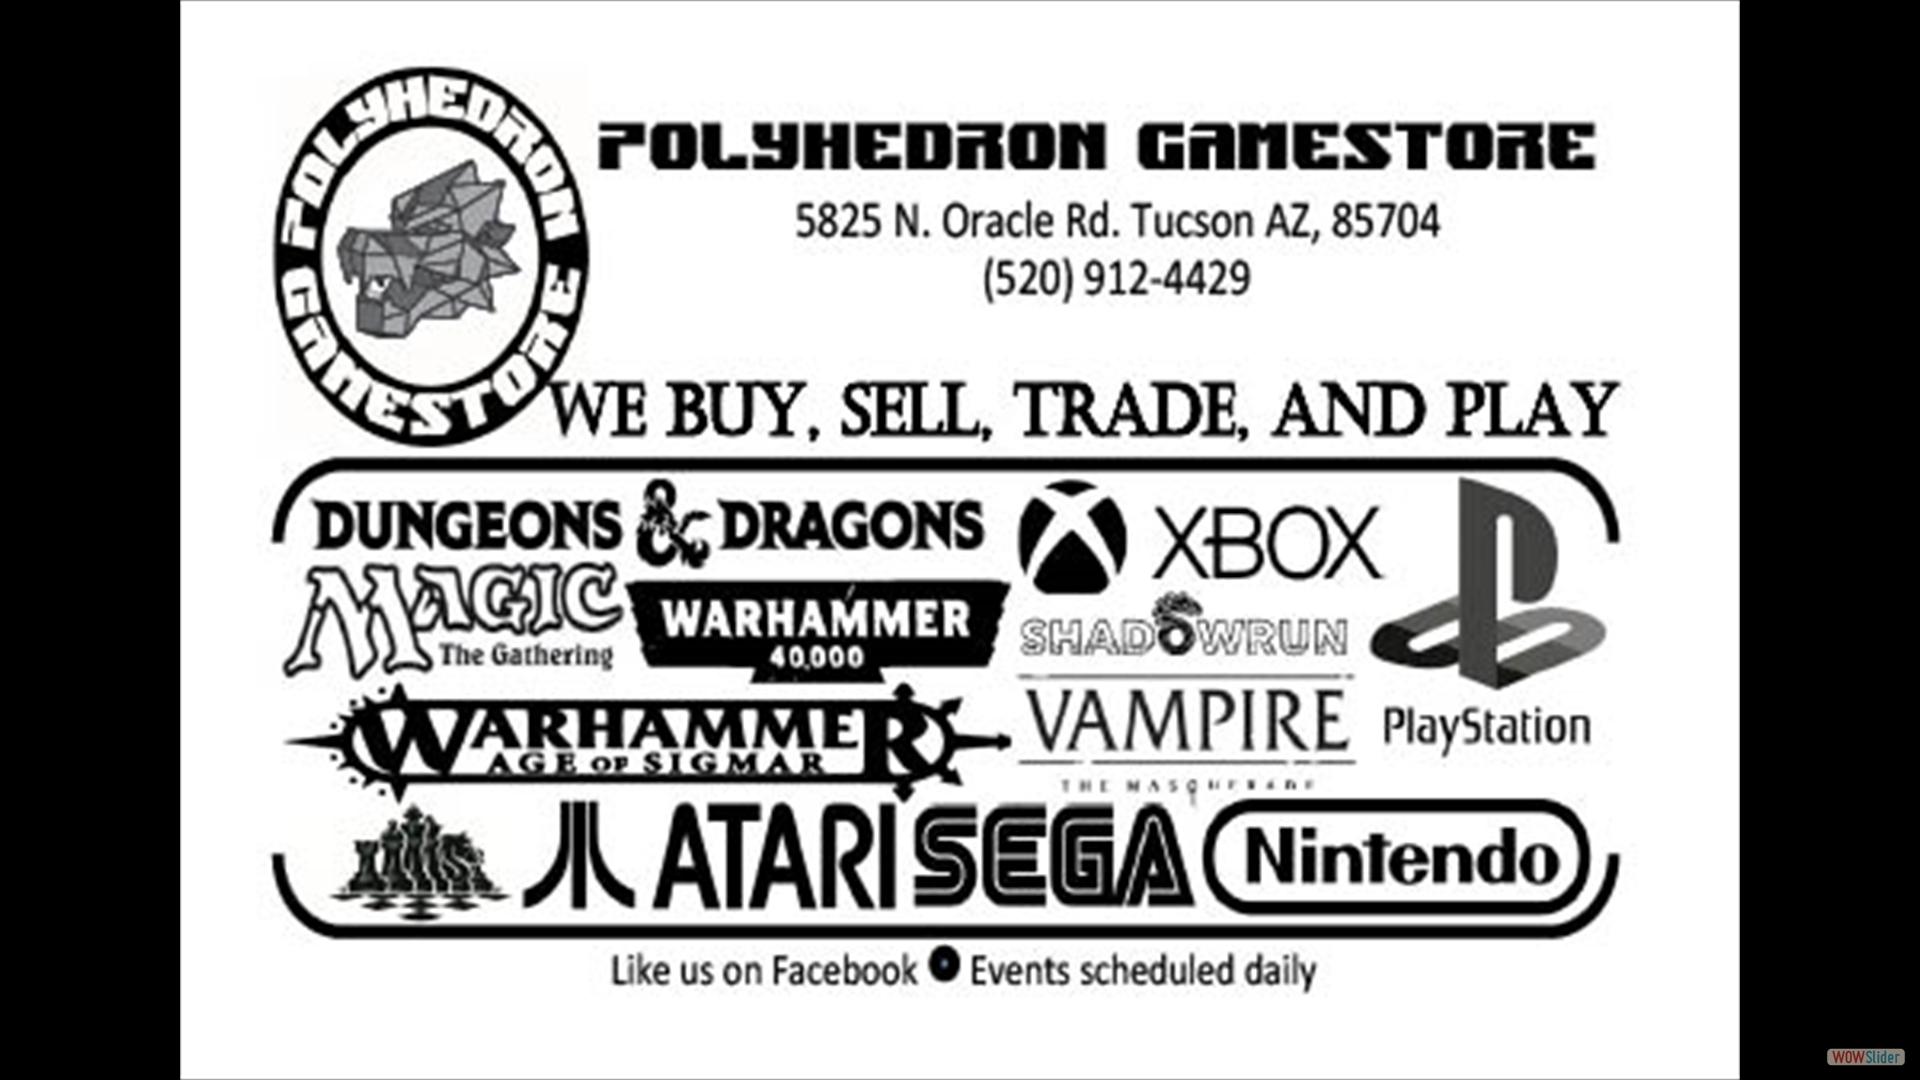 Polyhedron Gamestore borderless SINGLE